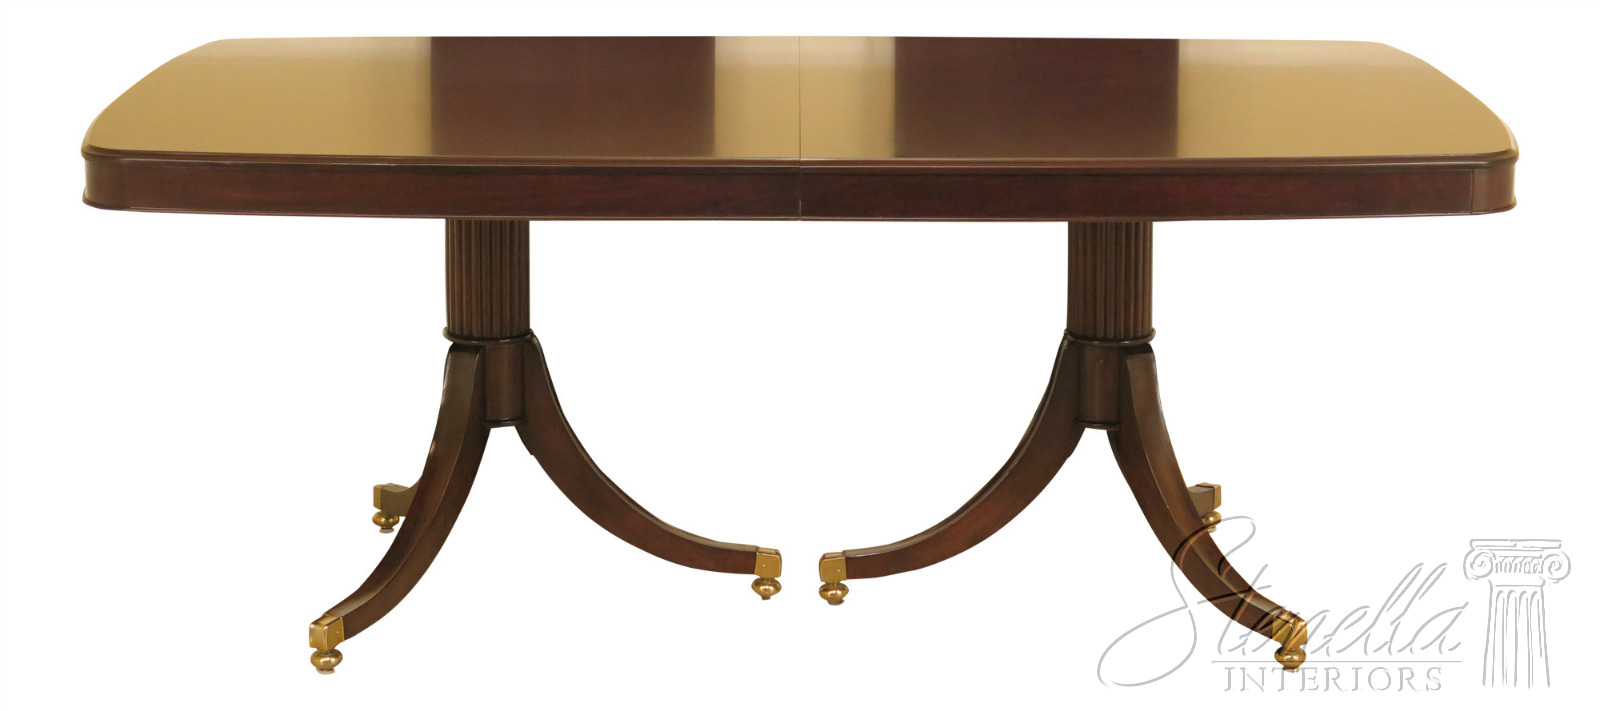 Details about LF47046EC: THOMASVILLE Dark Cherry Modern Duncan Phyfe Dining  Table